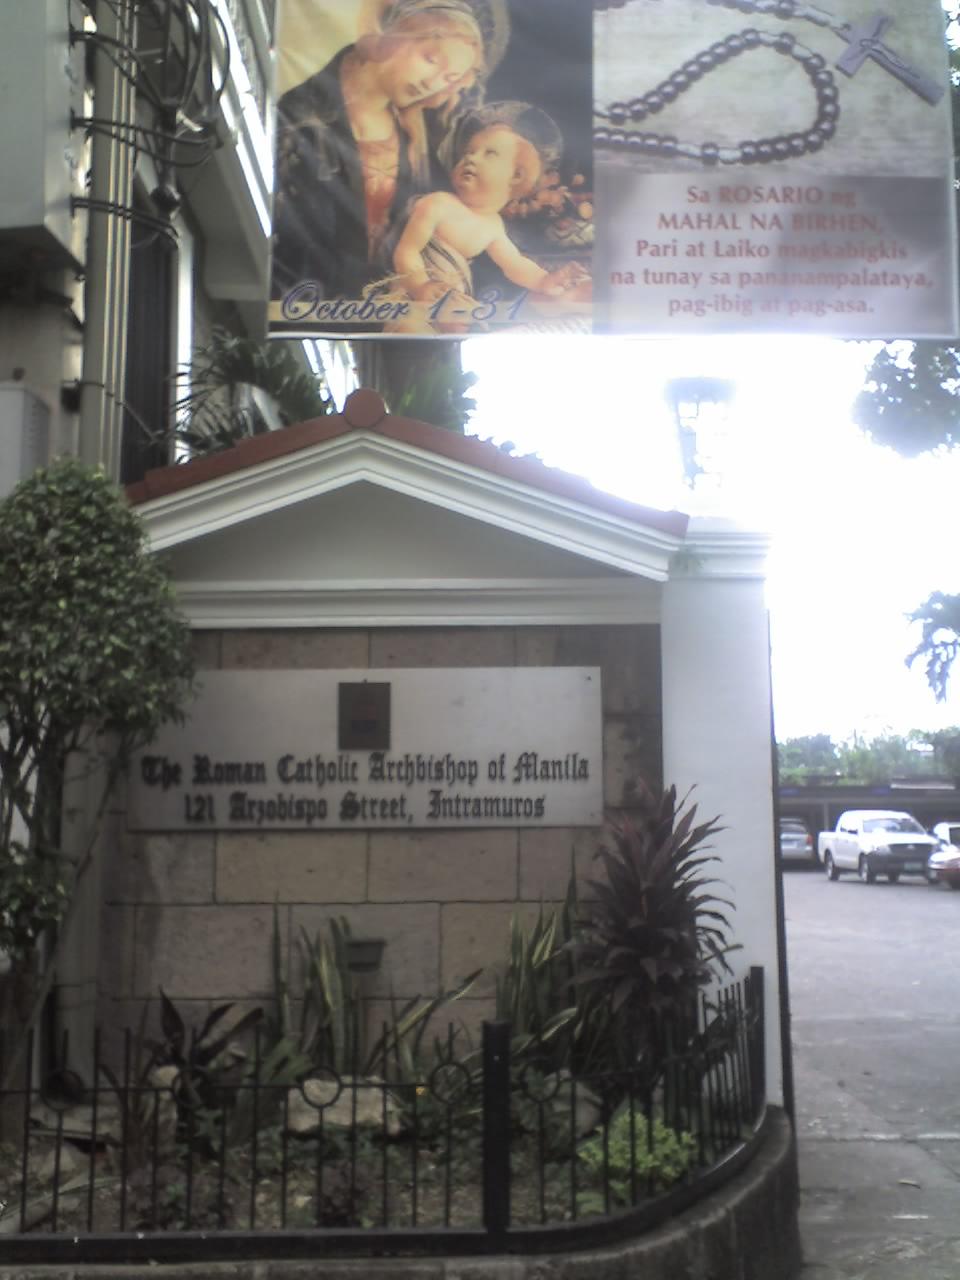 THE ROMAN CATHOLIC ARCHBISHOP OF MANILA